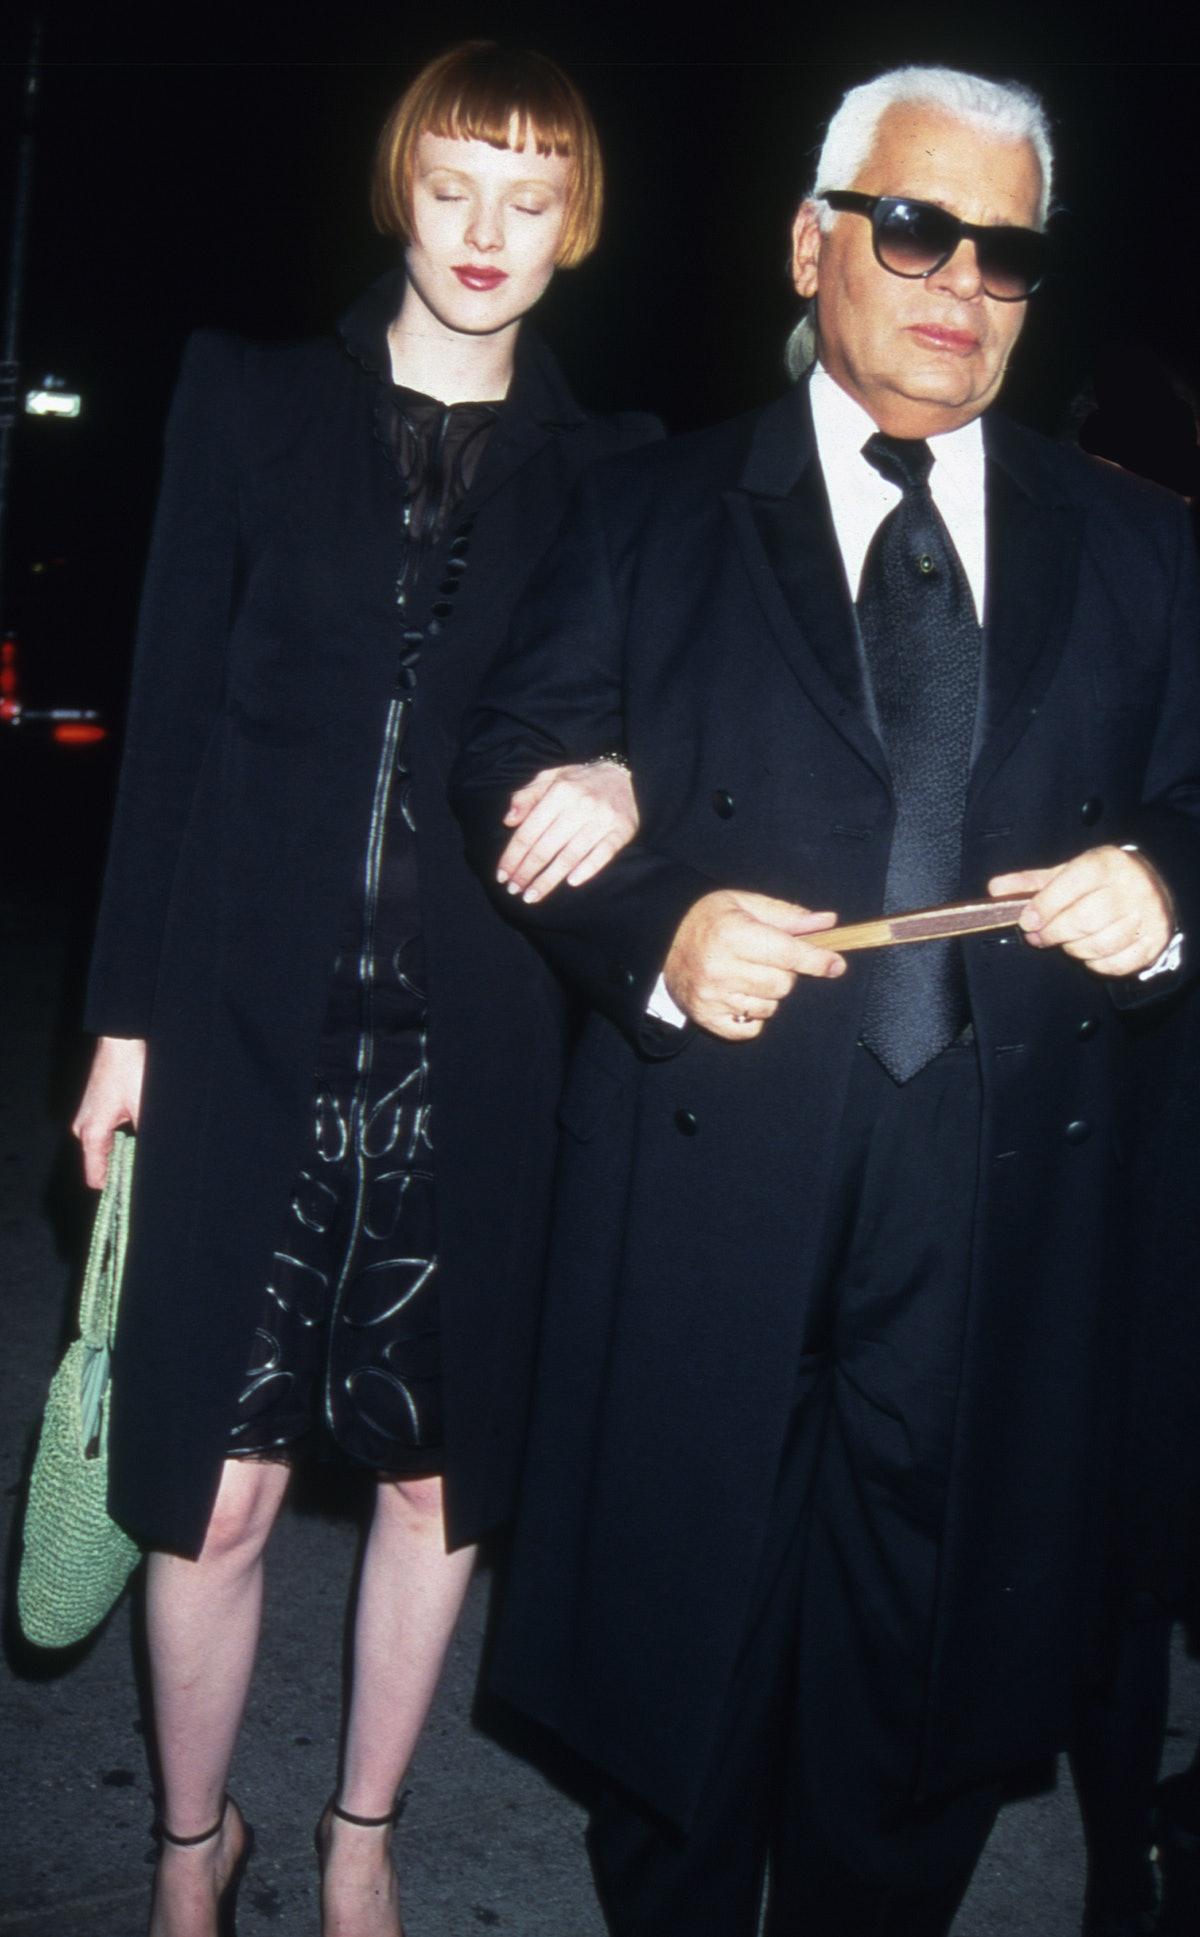 Karen Elson & Karl Lagerfeld on way to Pierre Hotel, gala,  New York - 1995